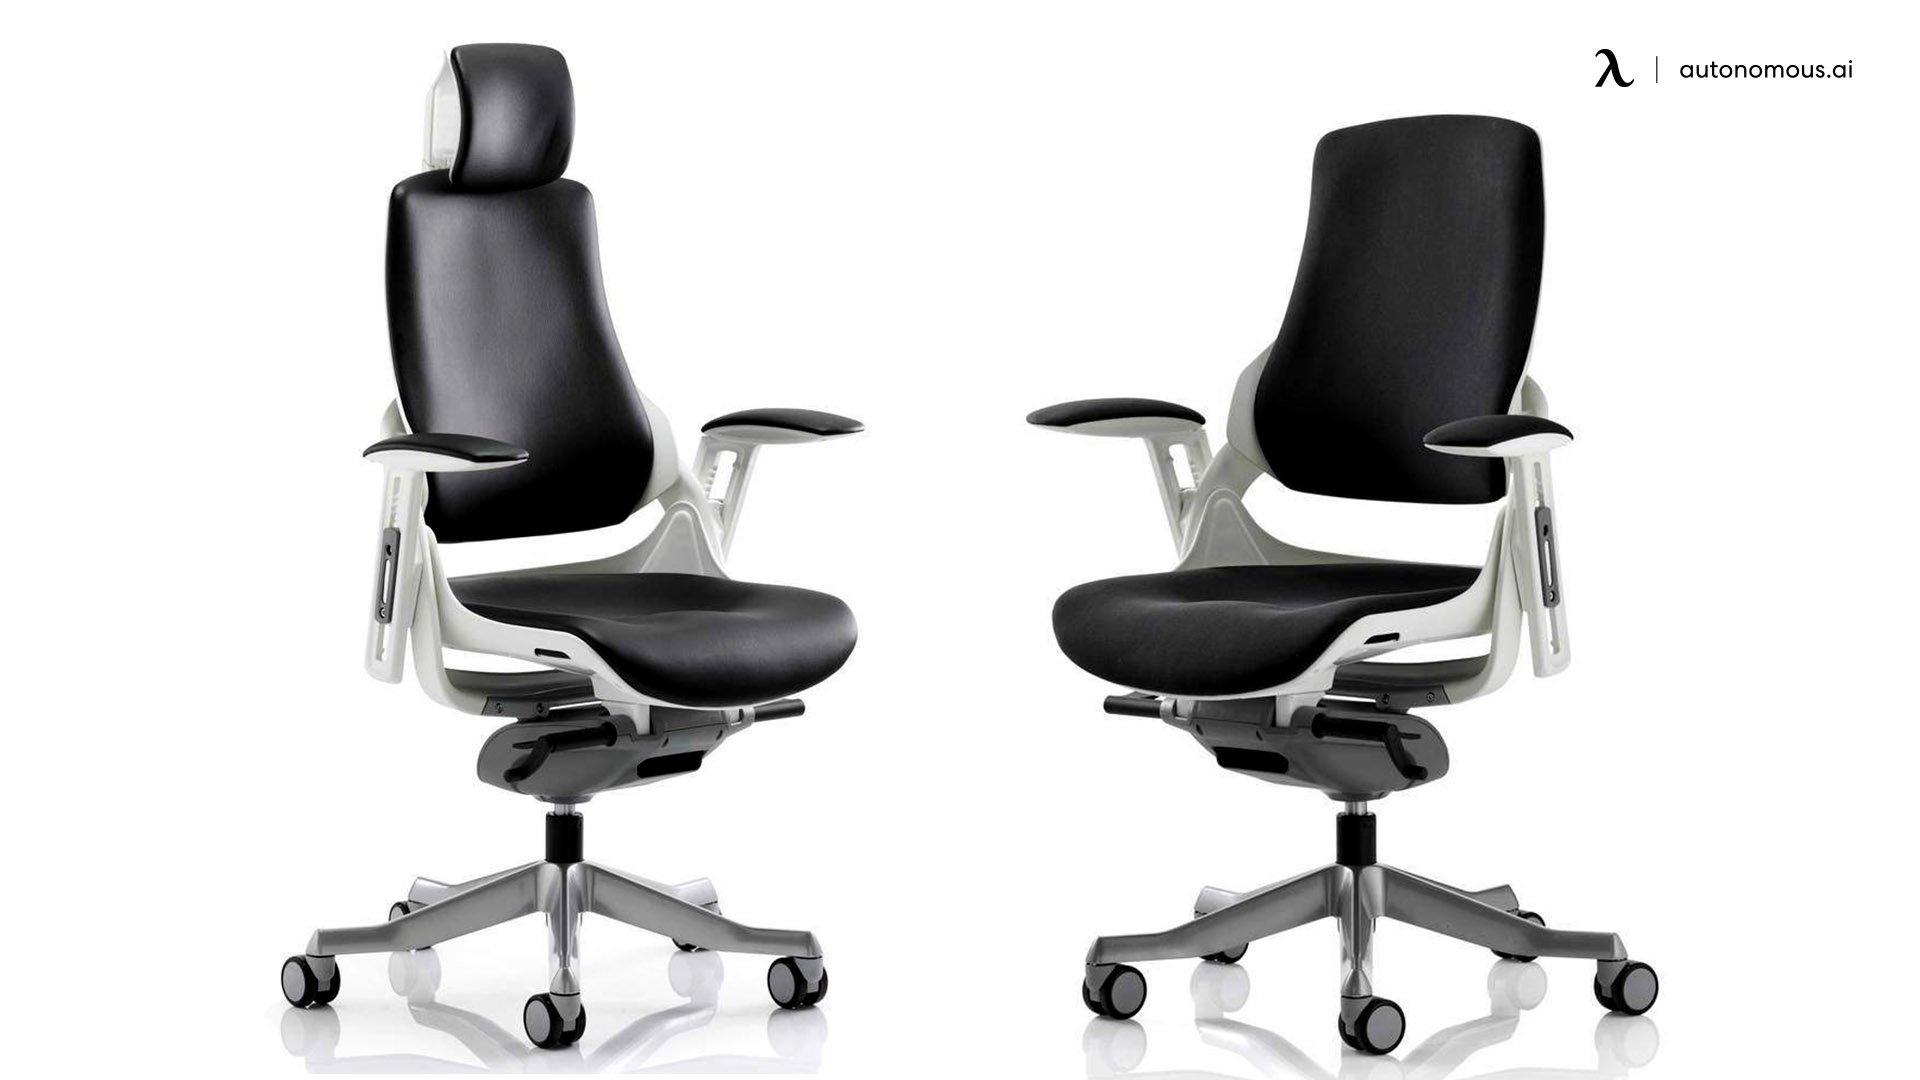 Zure Executive office chair